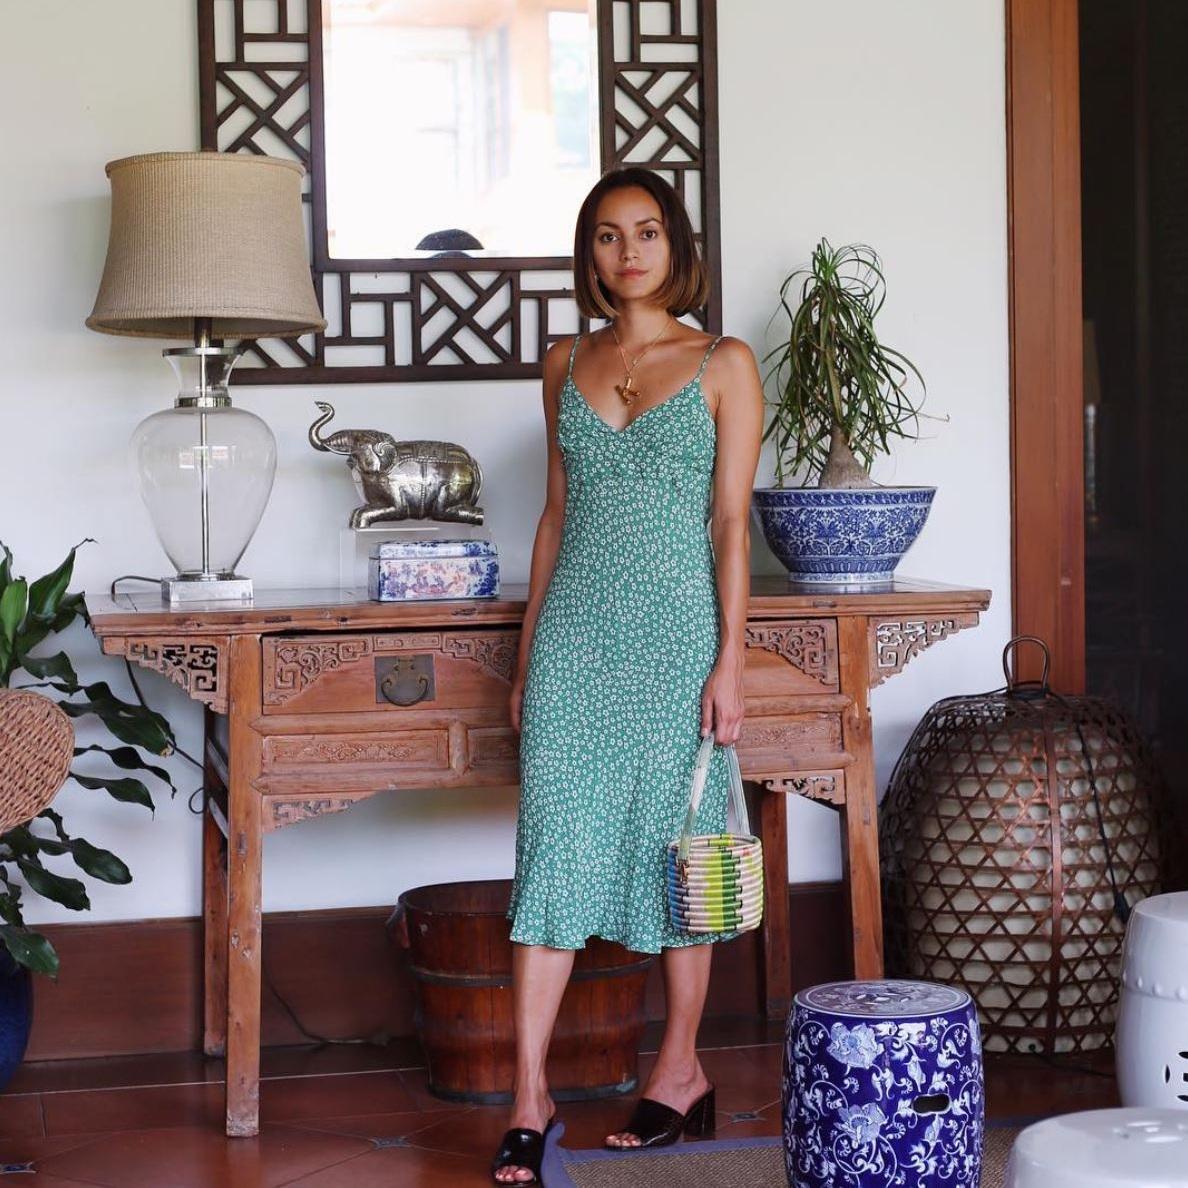 KATRINA RAZON - Heliconias Kimono  #DJ #ManagingPartnerKSR #almagirl #girlboss  @ The Phillipines